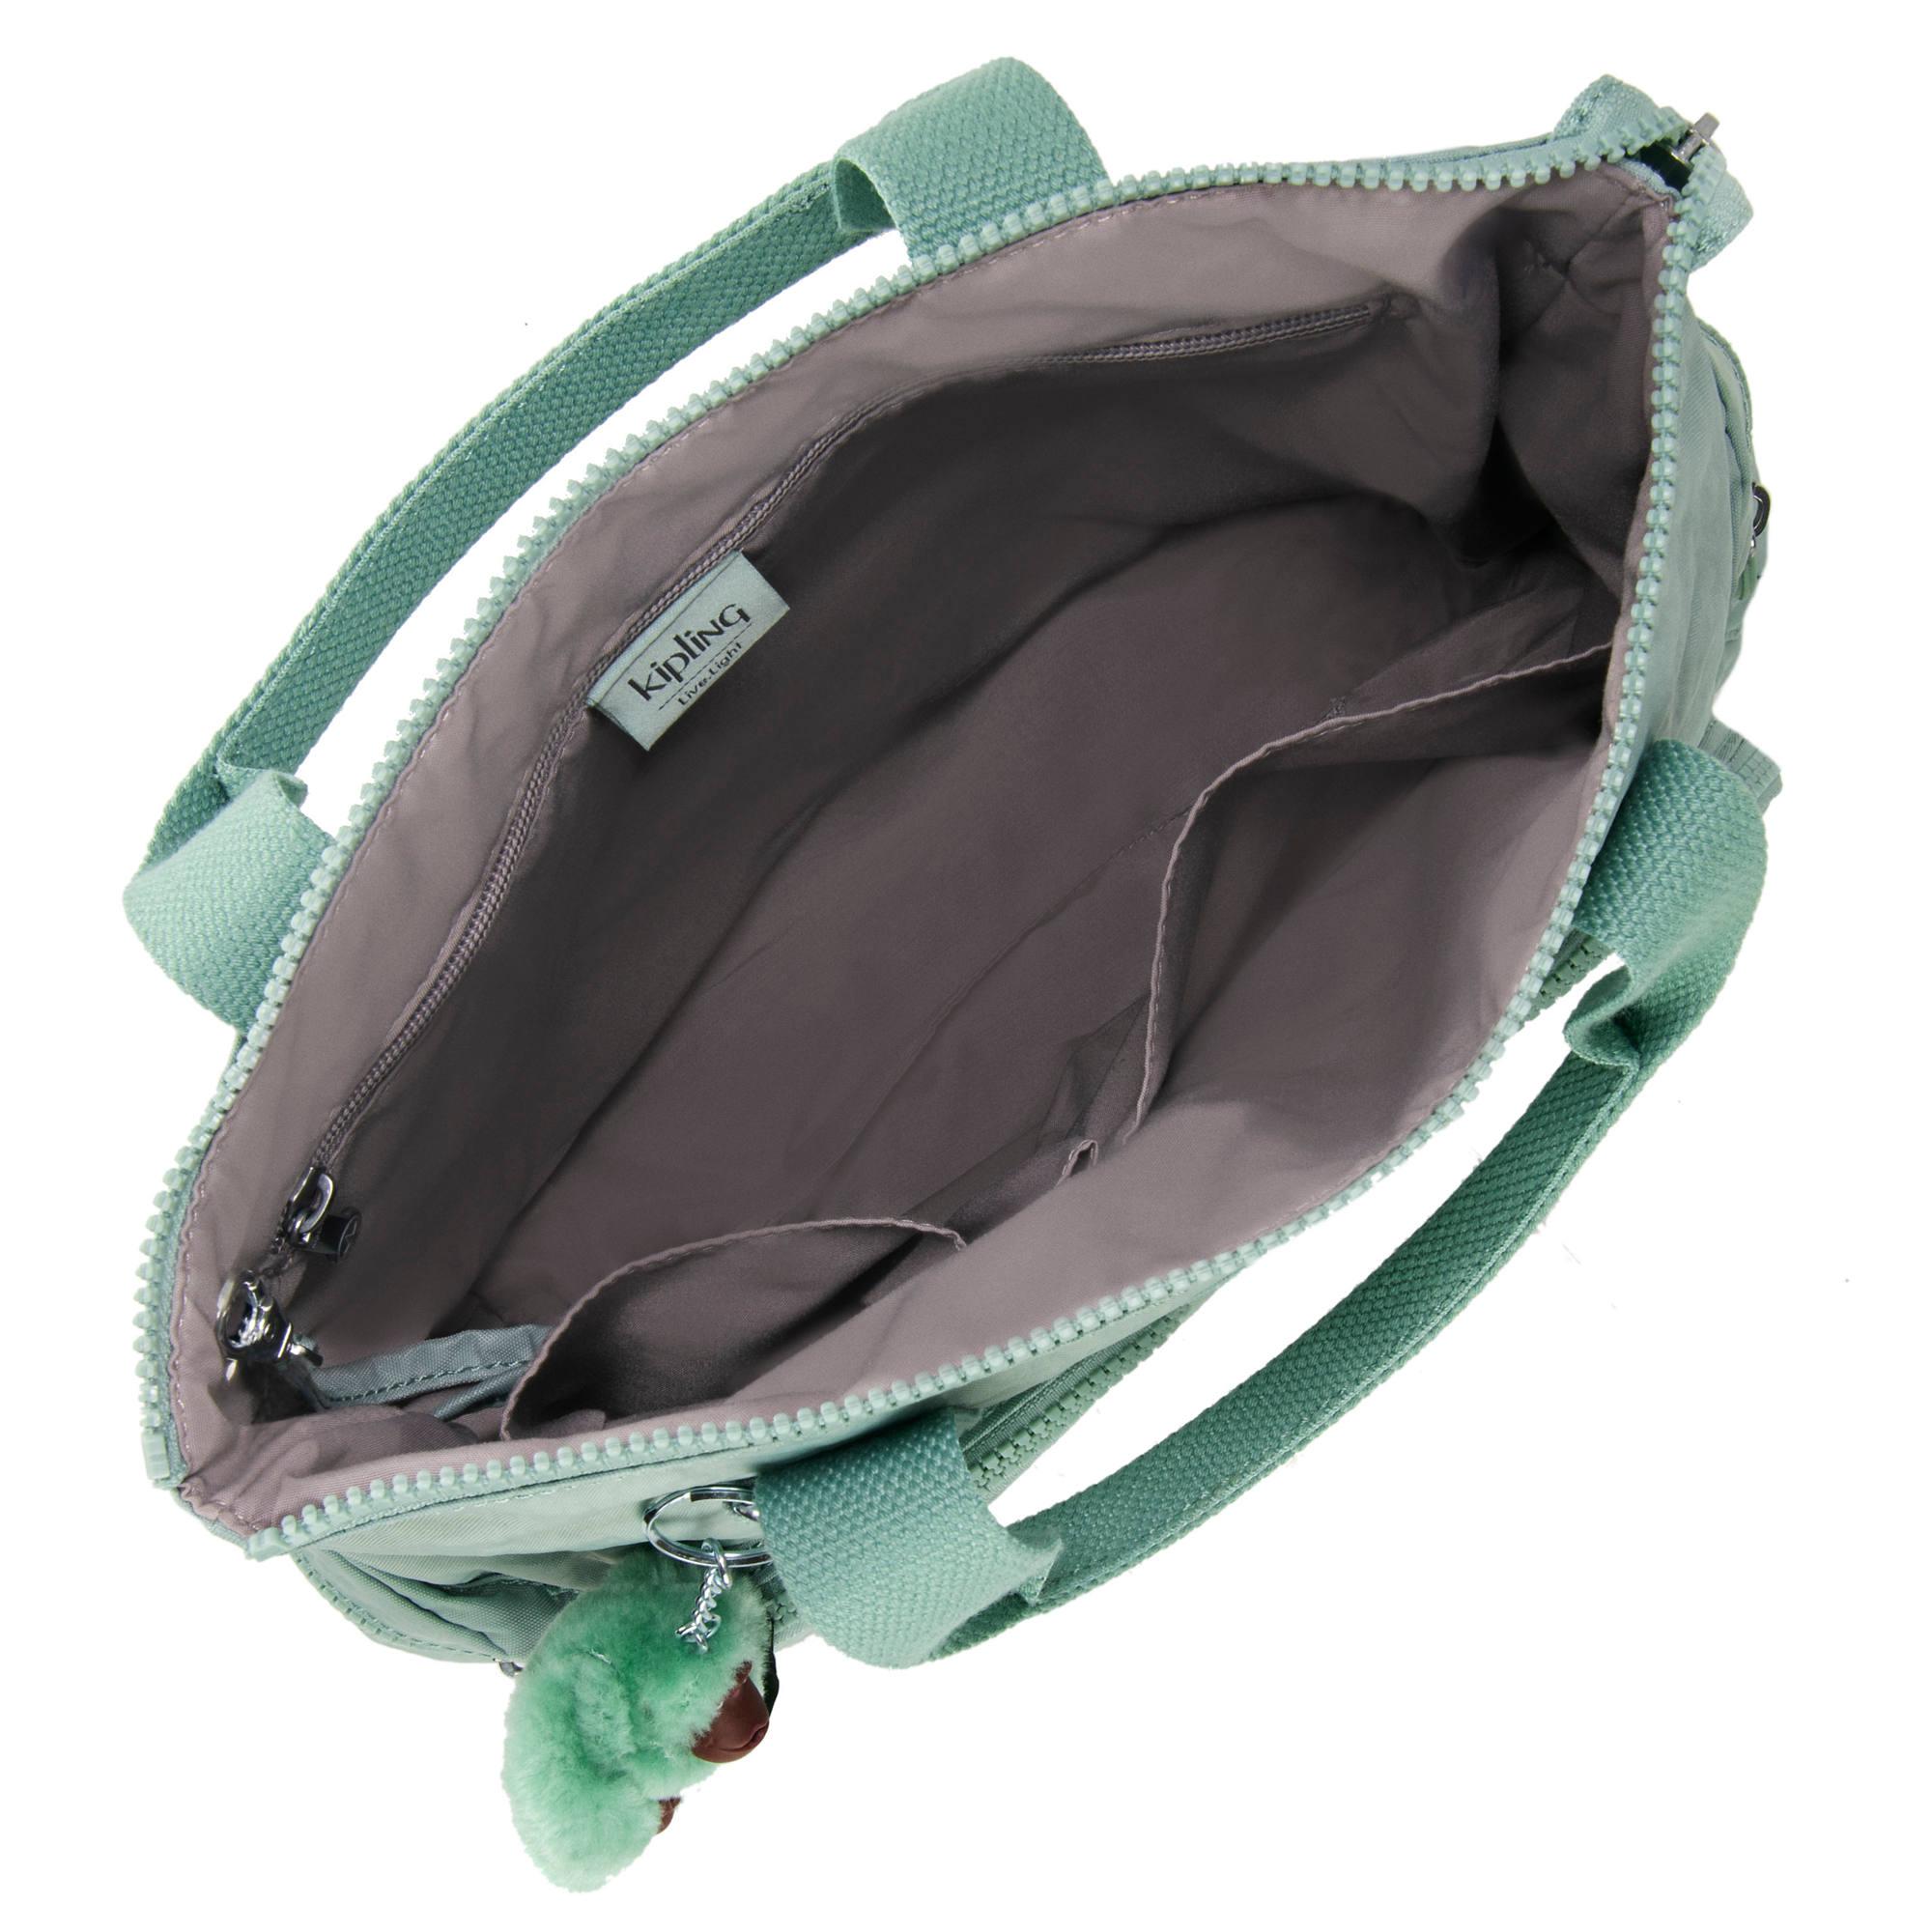 Kipling-Alvy-2-In-1-Convertible-Tote-Bag-Backpack miniatura 21